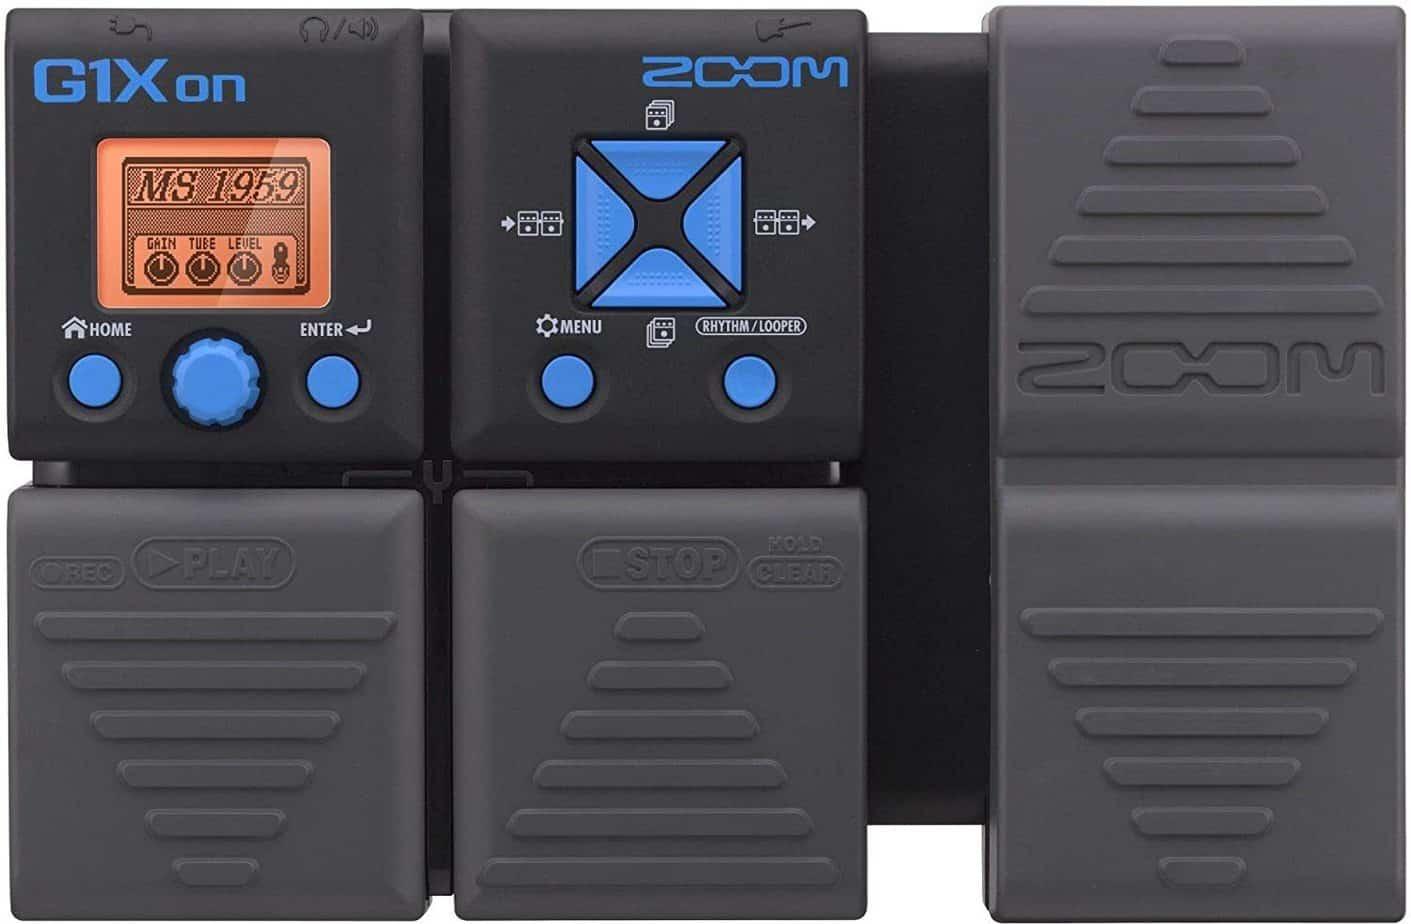 Zoom G1Xon Effect Processor | Guitar Center